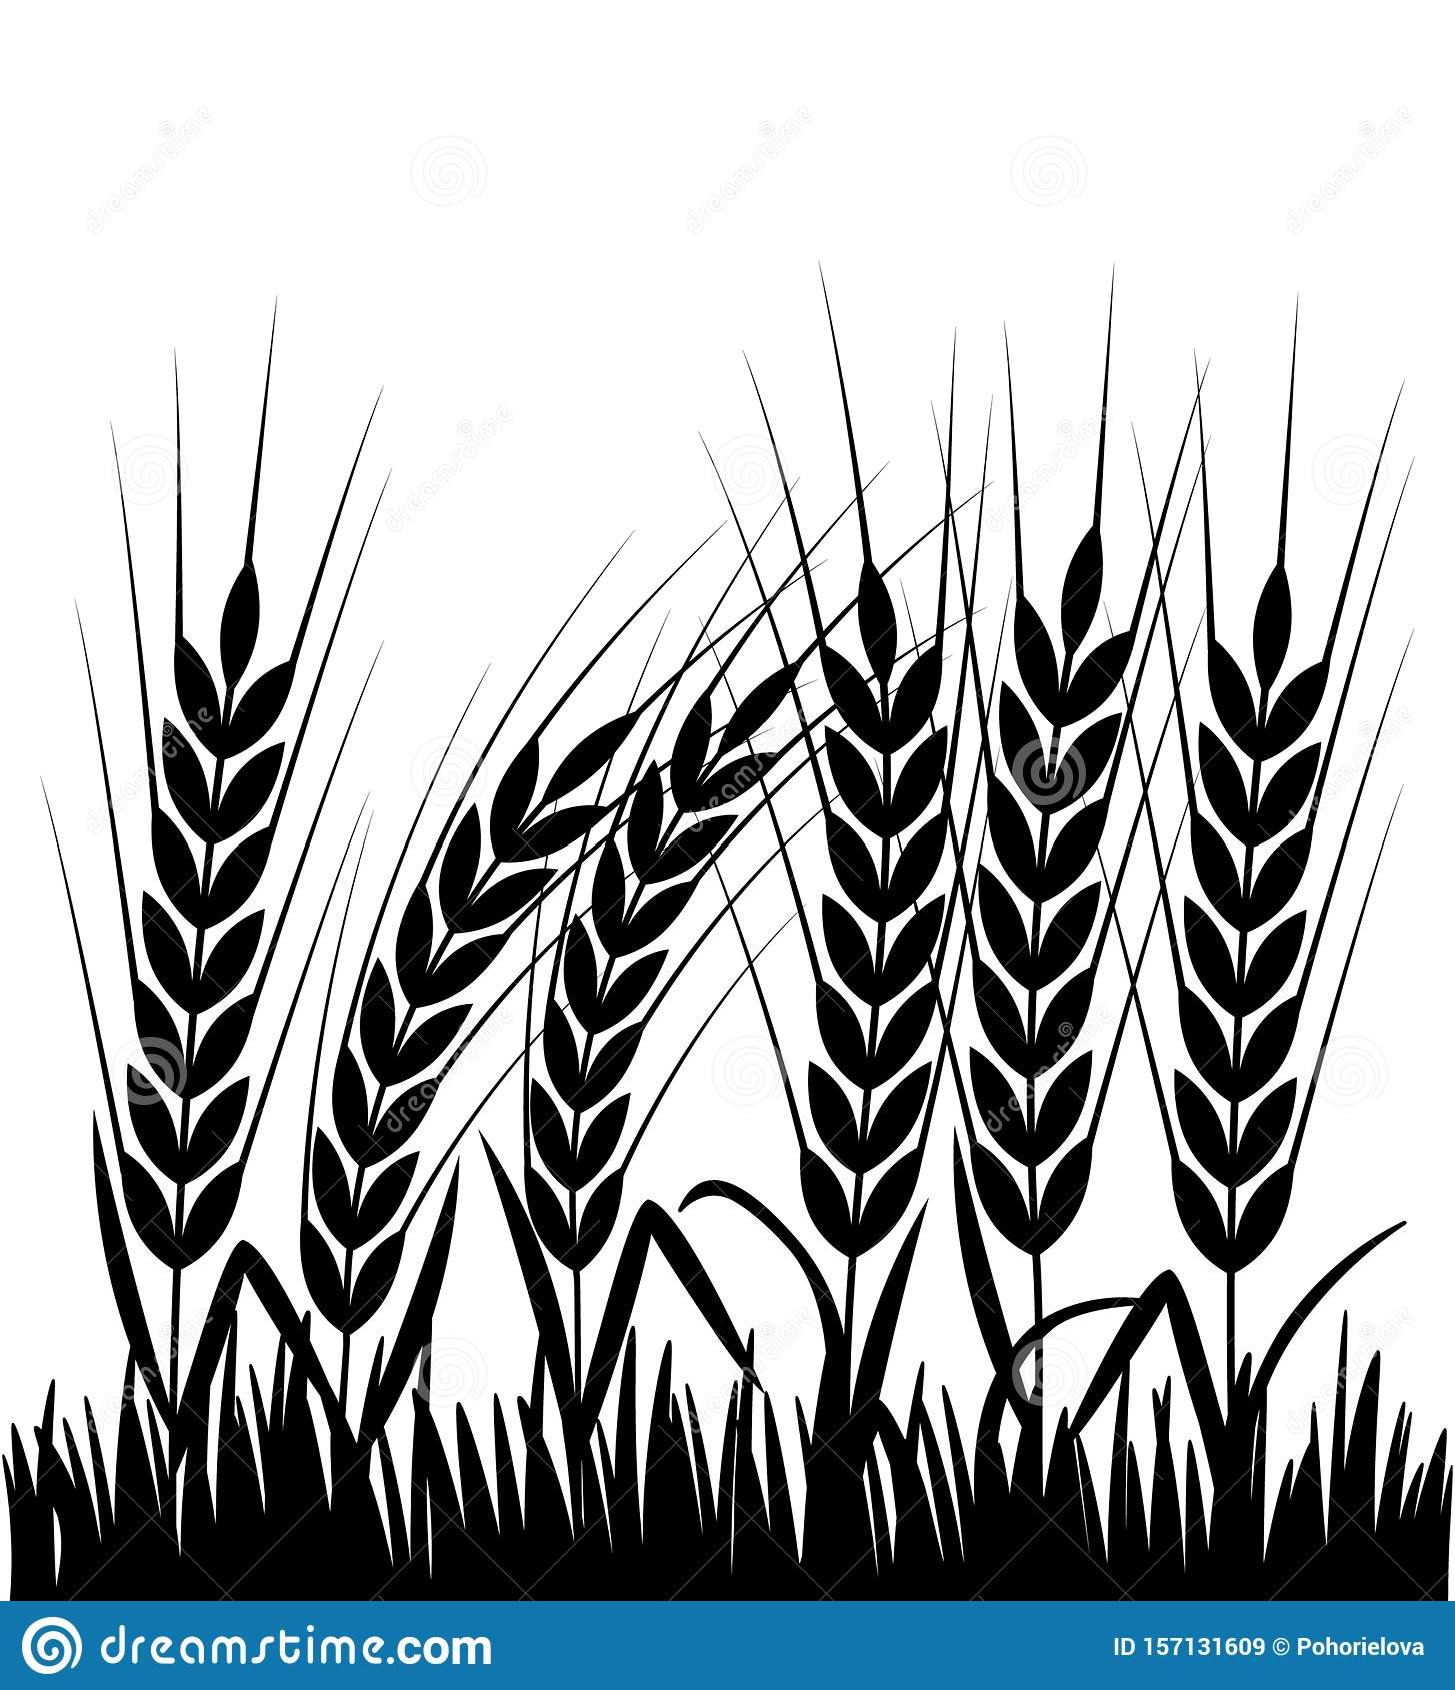 Corn Field Png Black And White & Free Corn Field Black And ...   Cornfield Silhouette